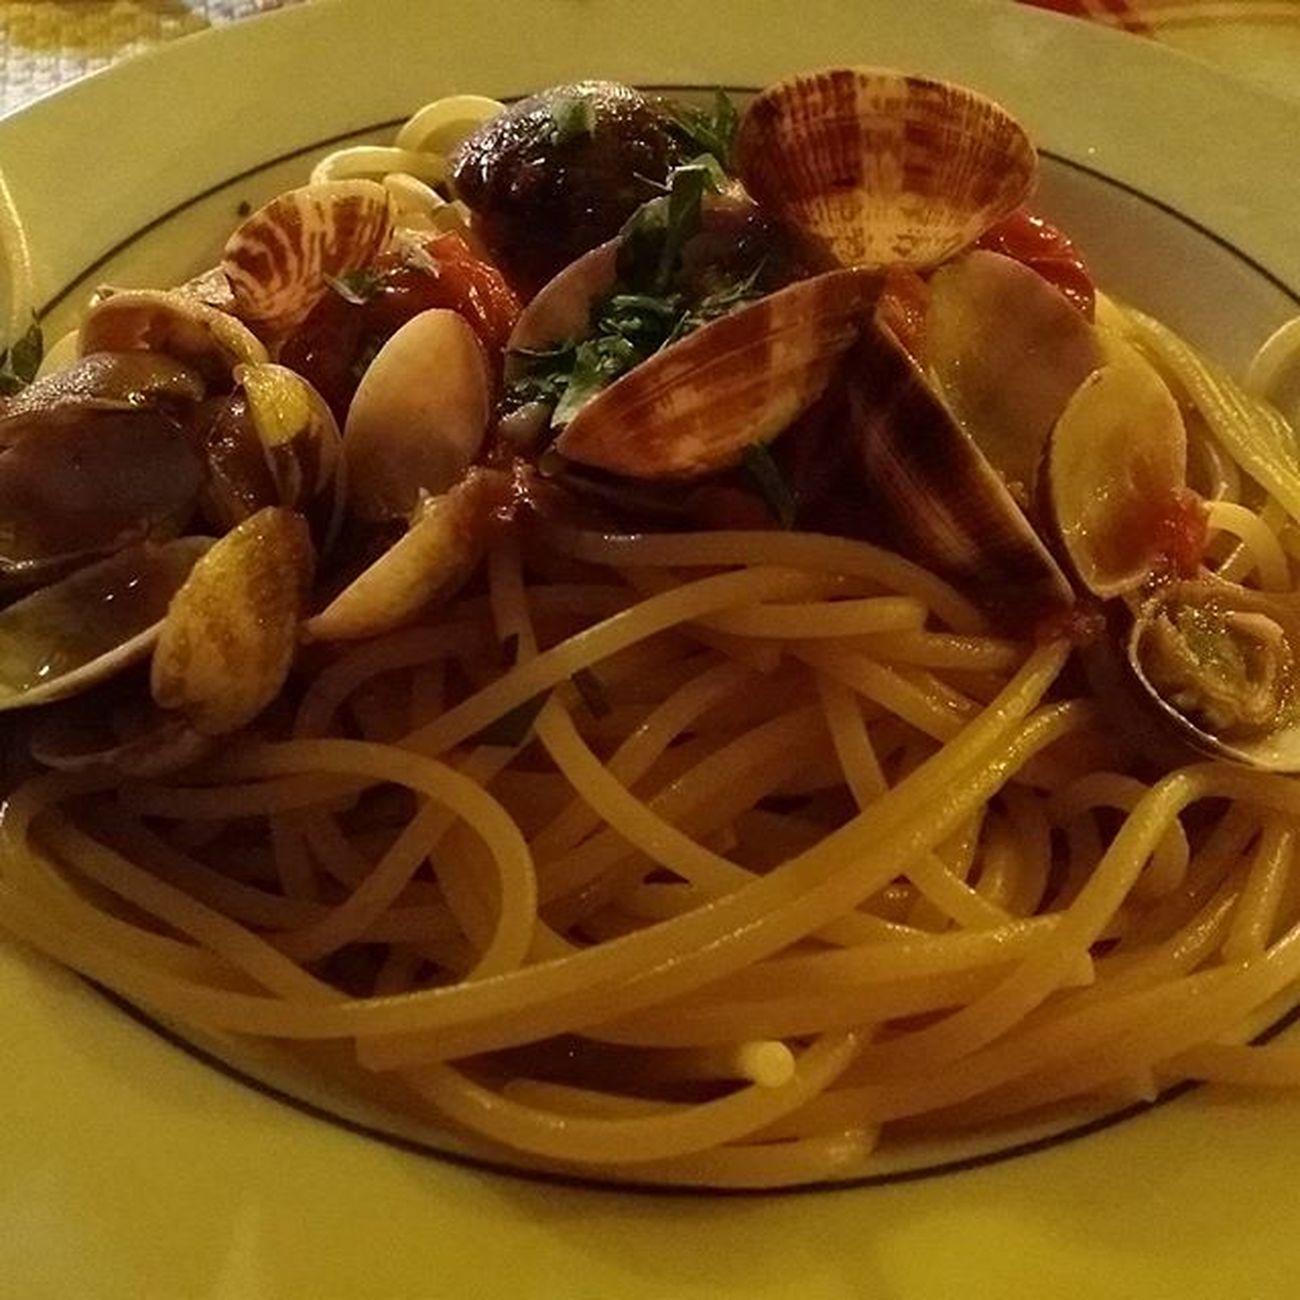 Stasera è così Sabatosera  Chalet Lunedìlainiziamo Giuro Napoli Naples Ilovefood Comediredino Instafood Instalike Instasaturday Instafriend Insta